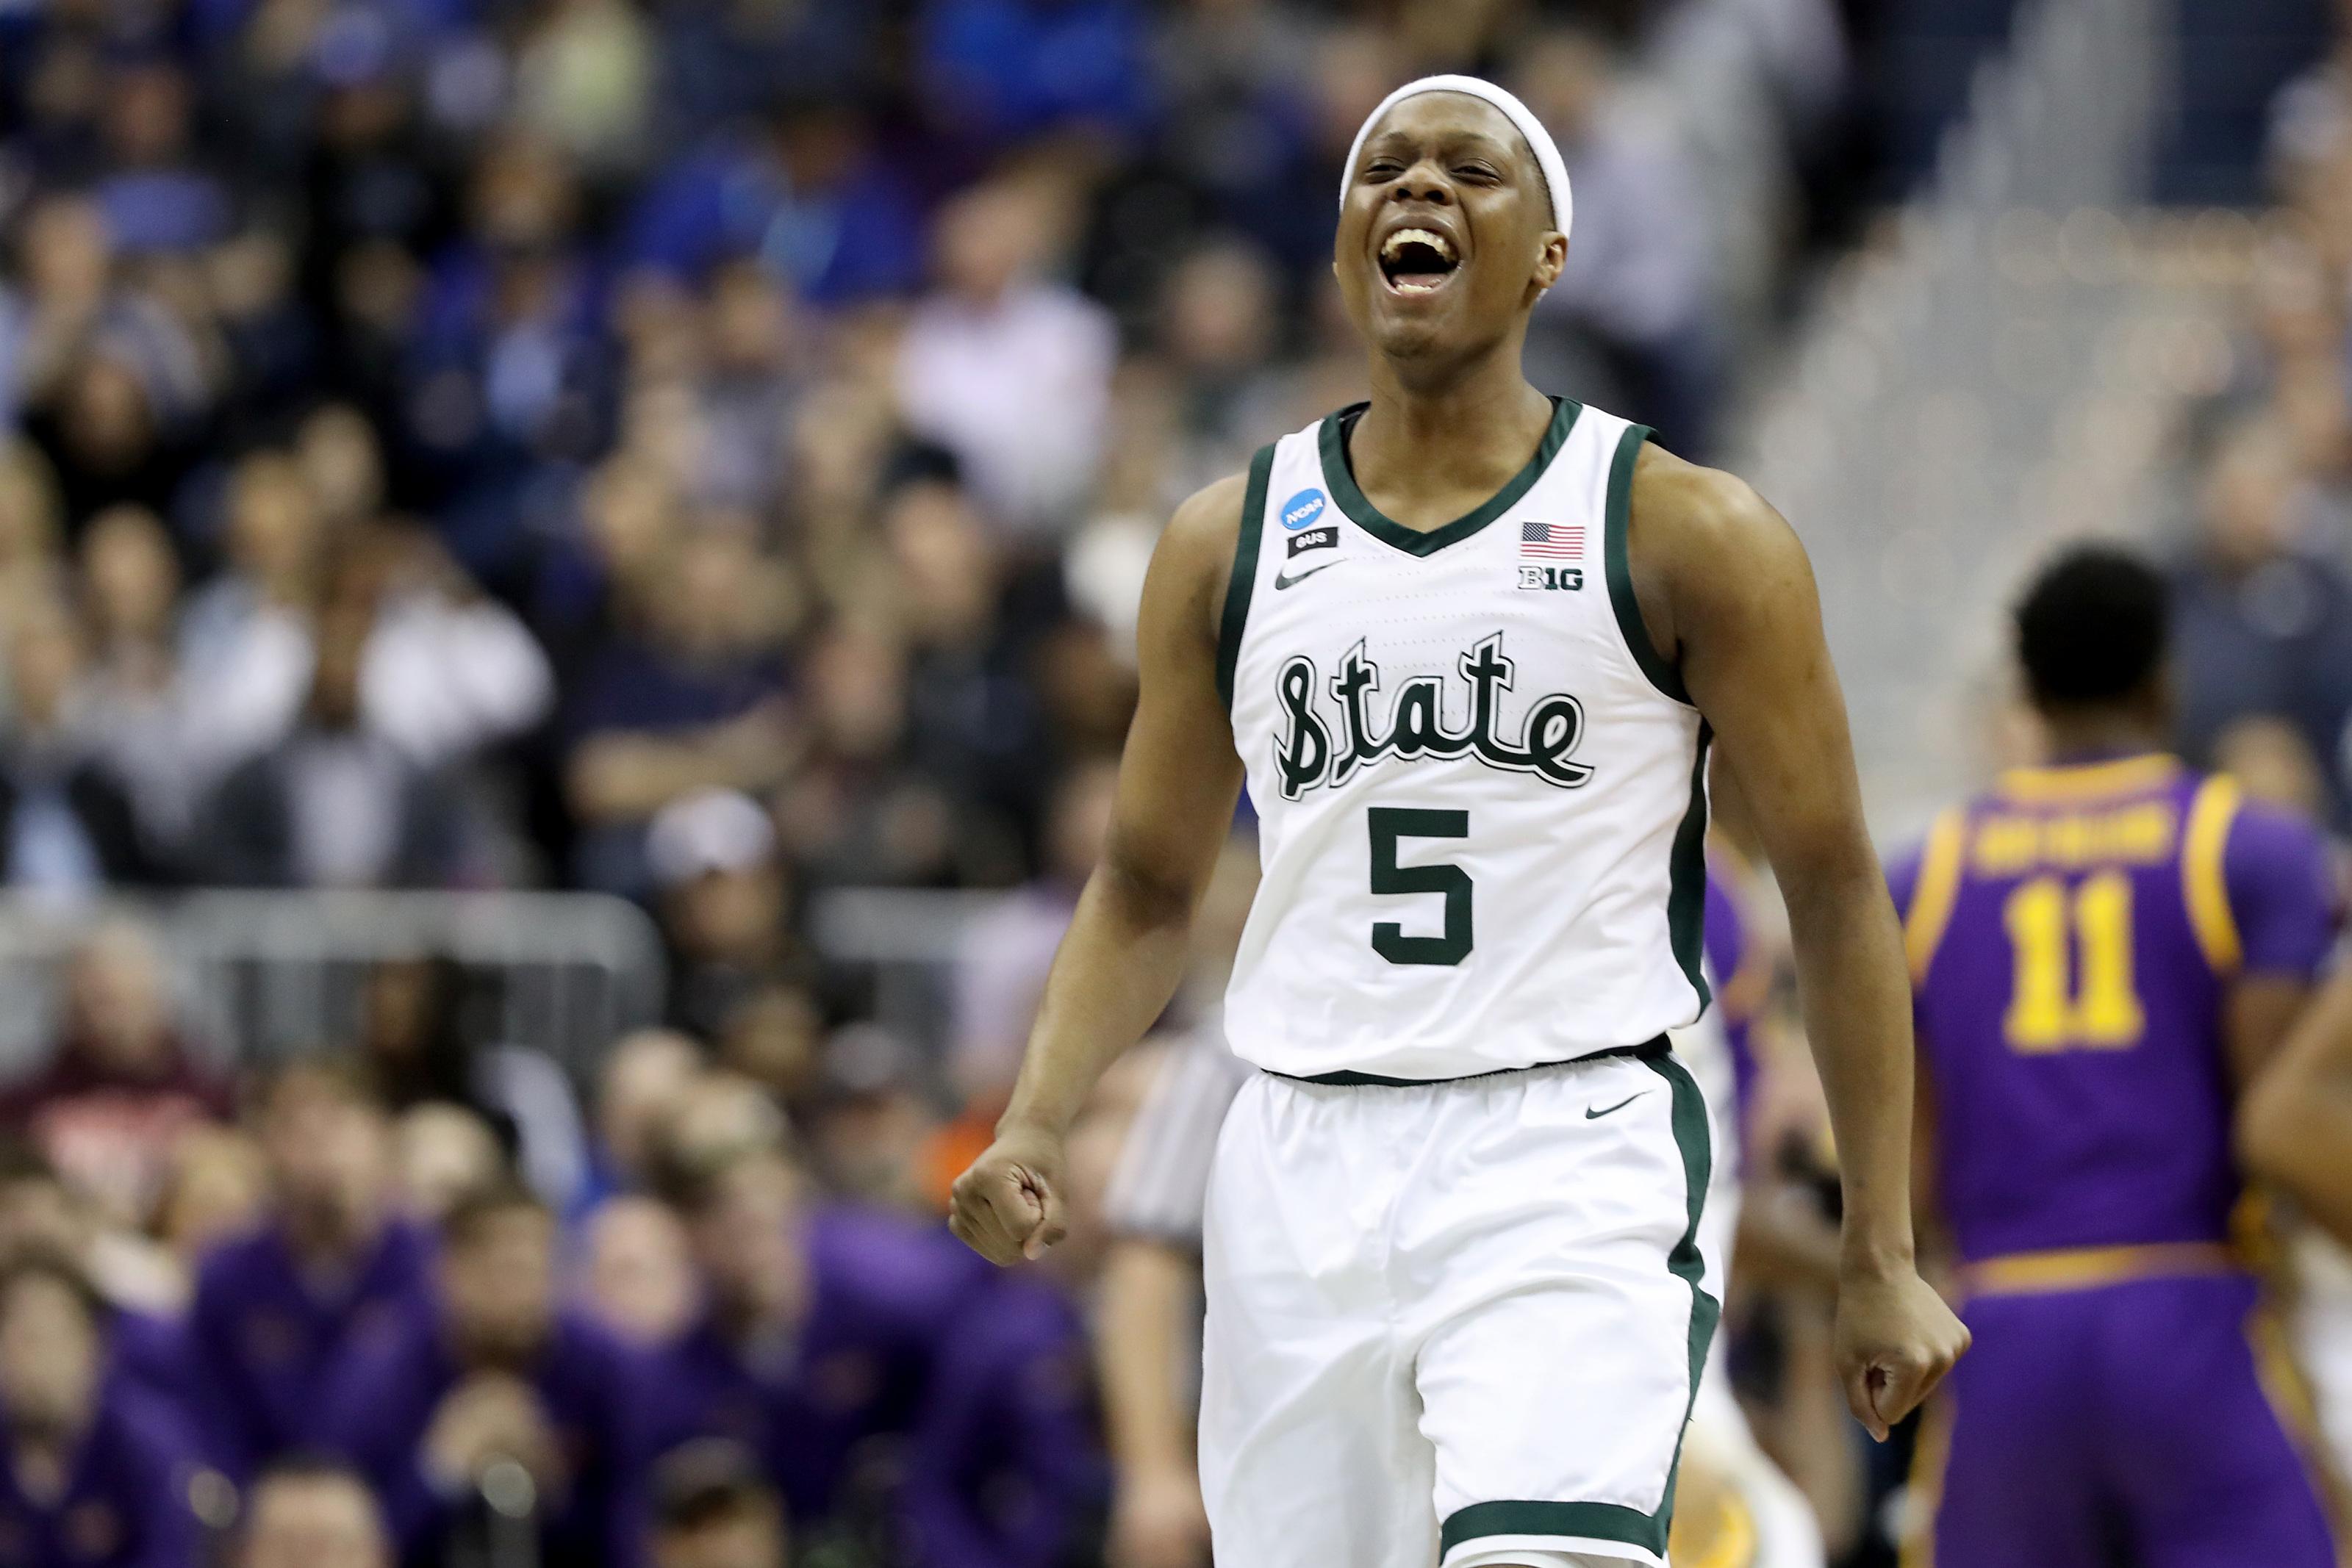 Michigan State basketball Mount Rushmore may soon add Cassius Winston